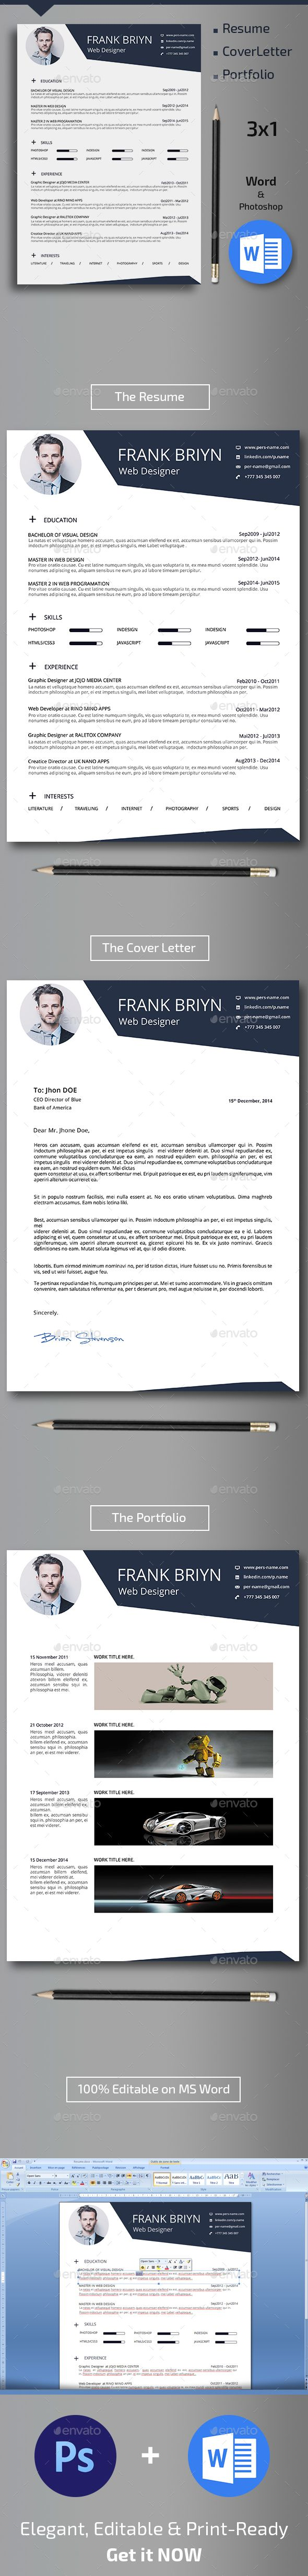 Resume Template PSD design Download httpgraphicrivernetitem 435